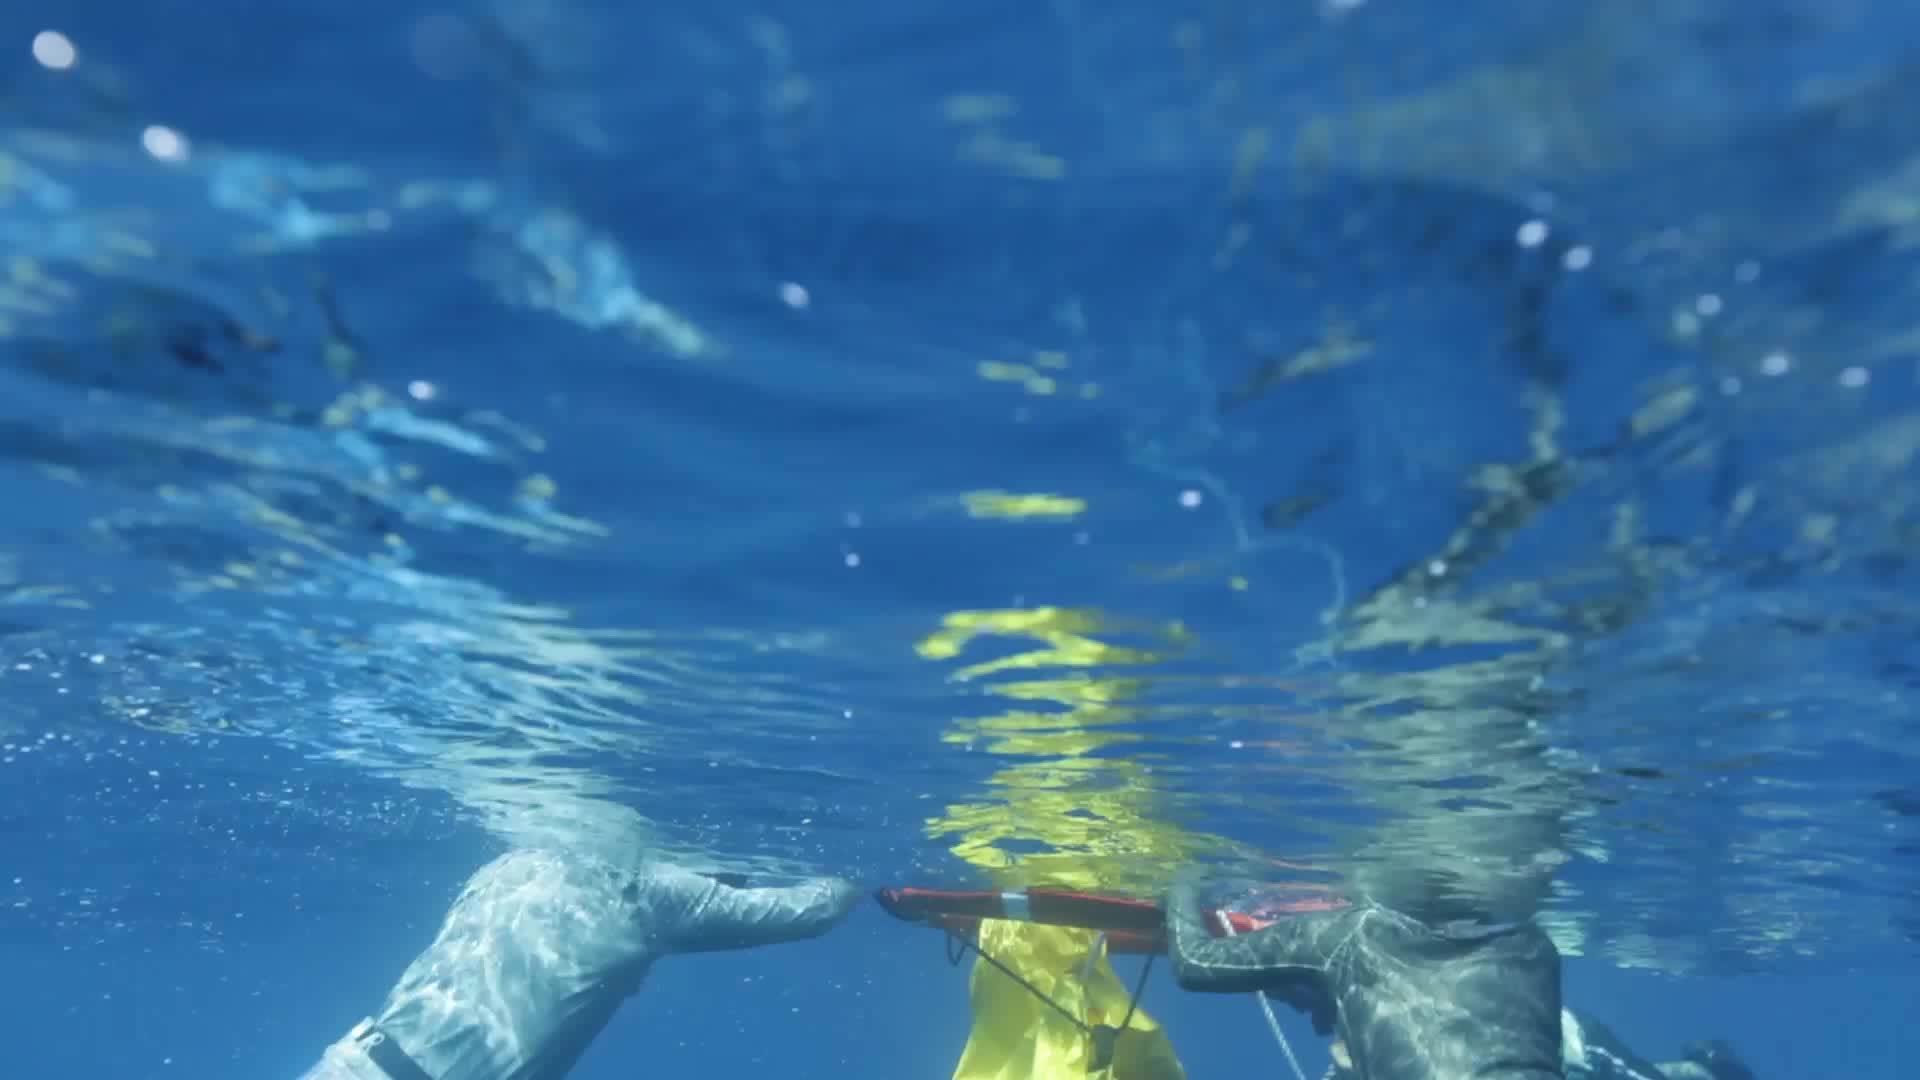 adrian grenier water pollution ocean whales essay